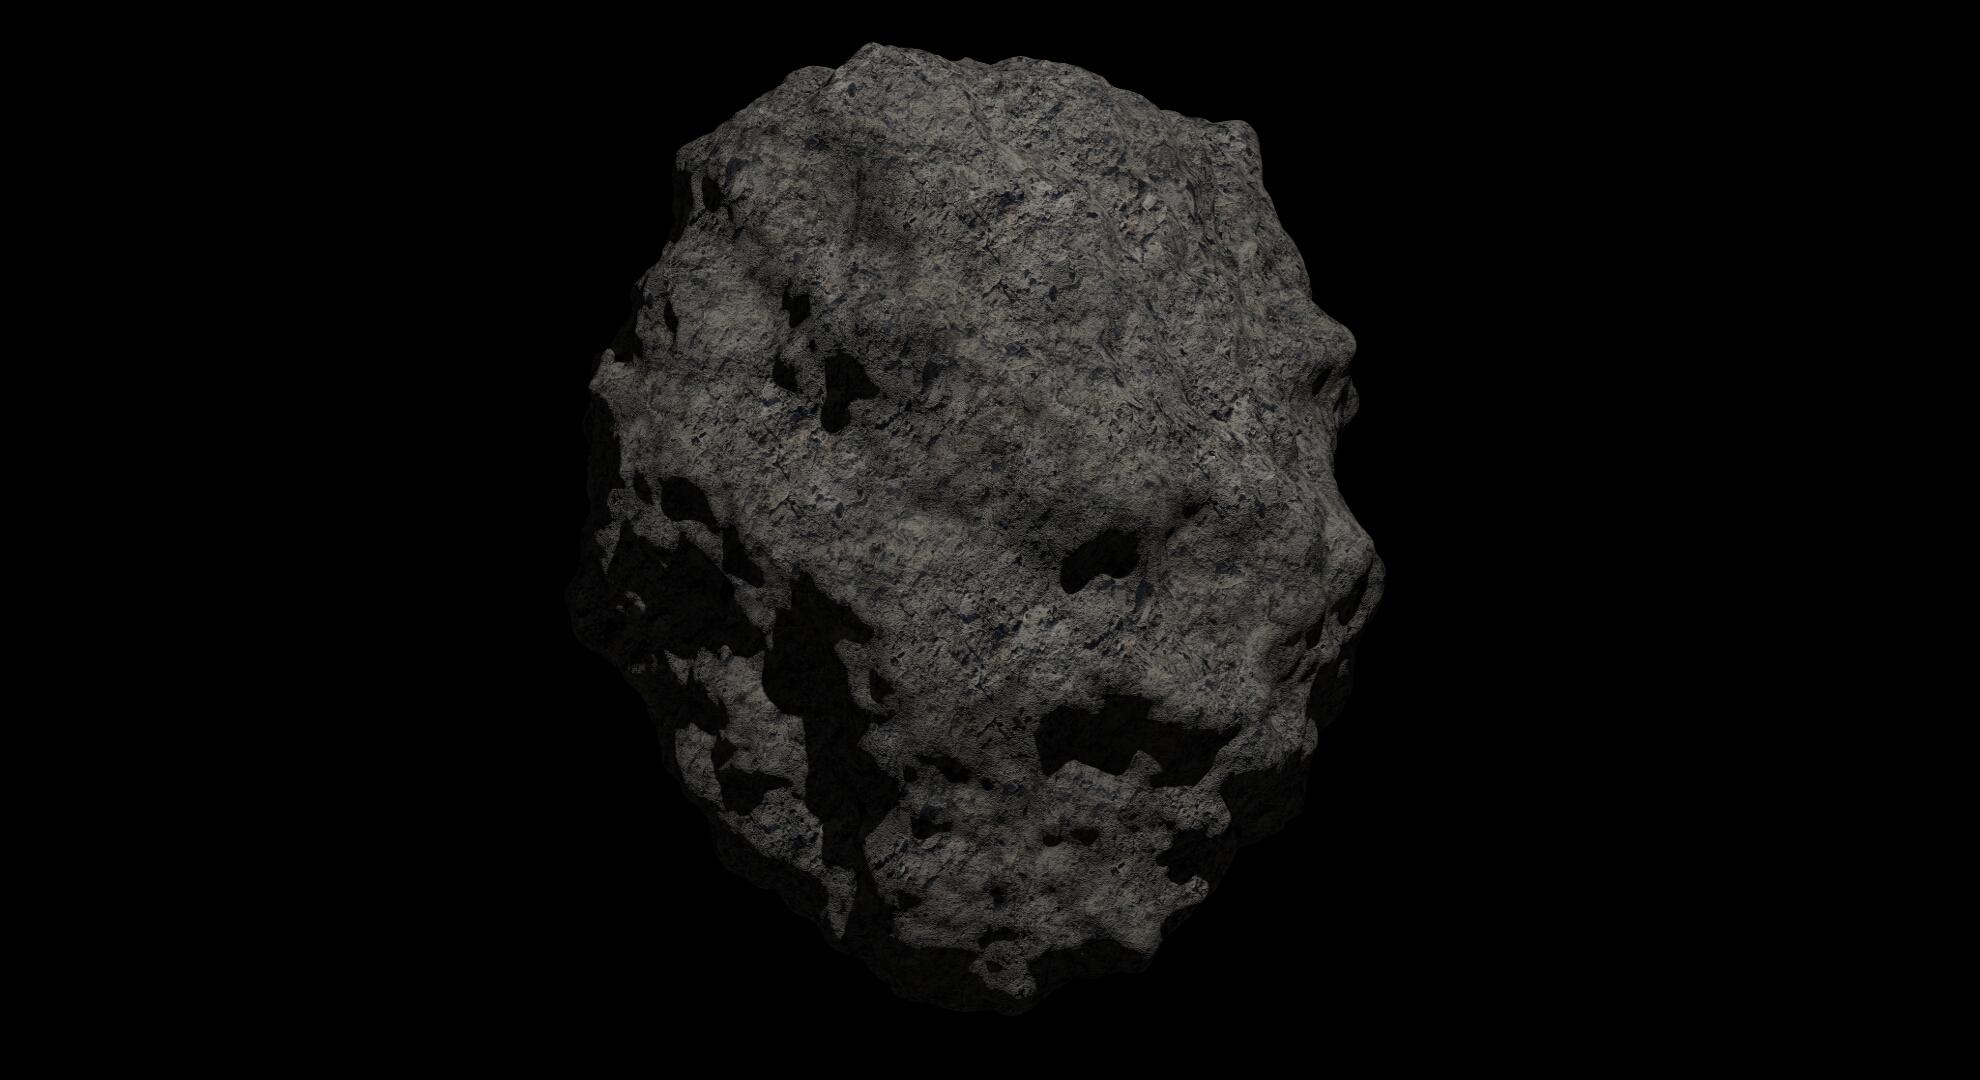 fantasy asteroid 2 3d model 3ds blend dae fbx obj 267194